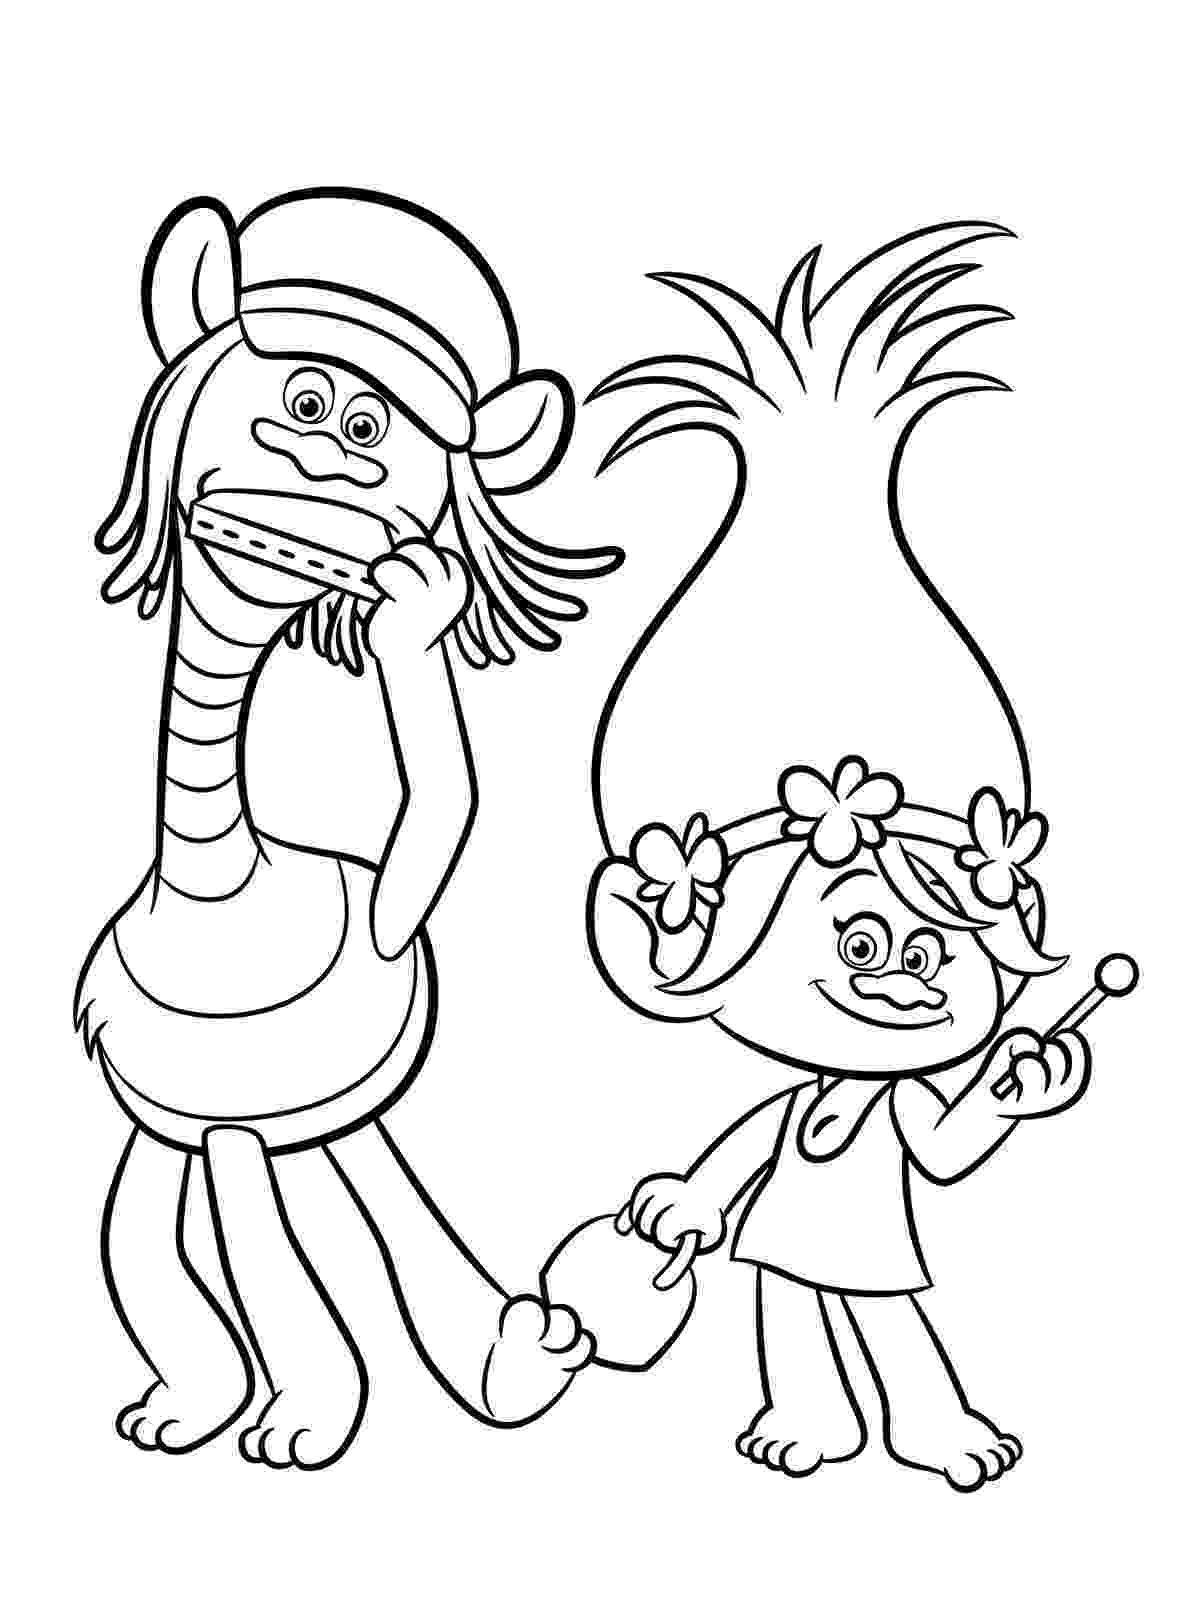 printable coloring pages trolls trolls movie coloring pages best coloring pages for kids pages printable trolls coloring